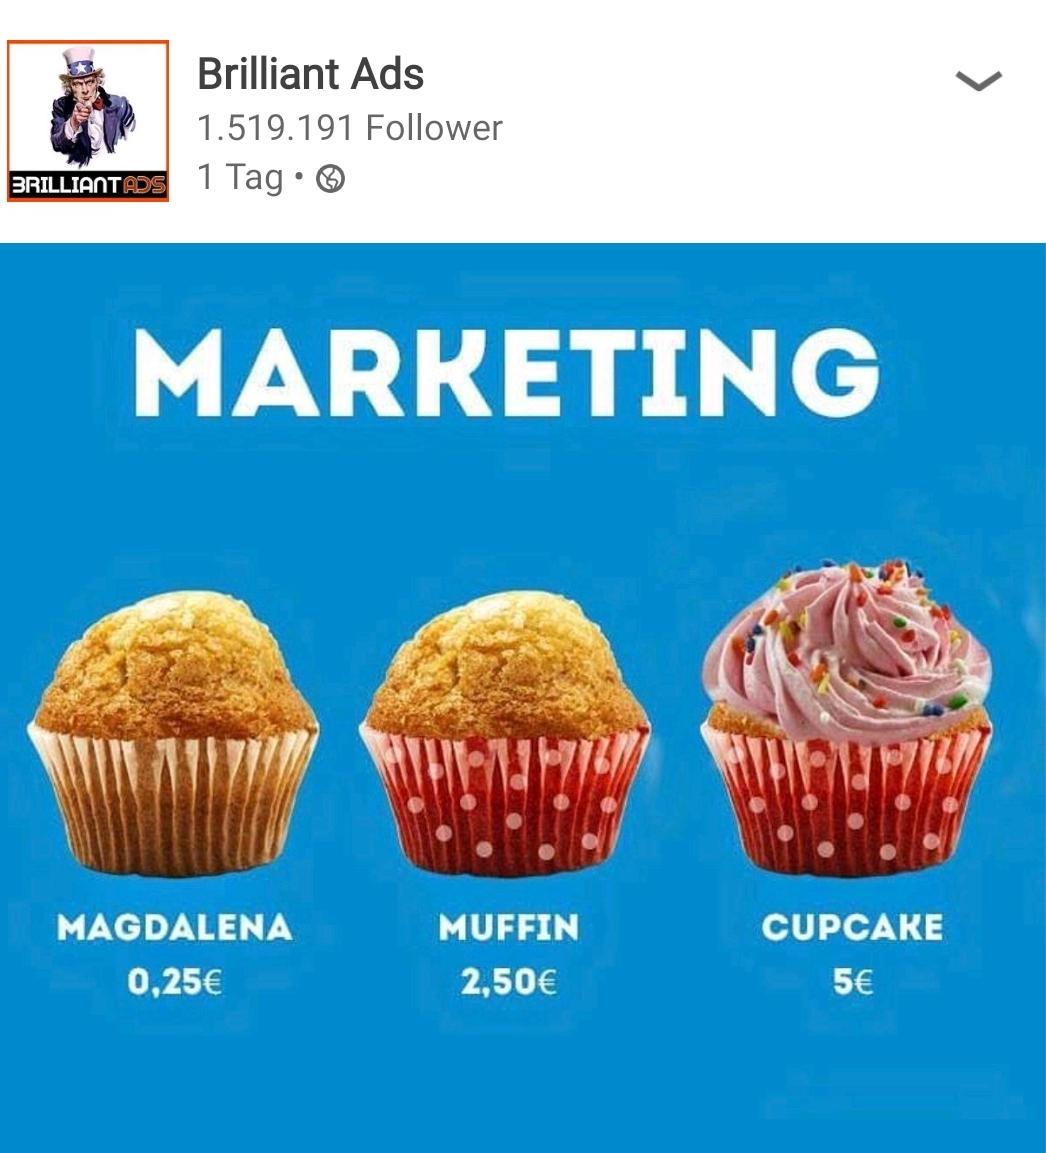 Marketing is very simple